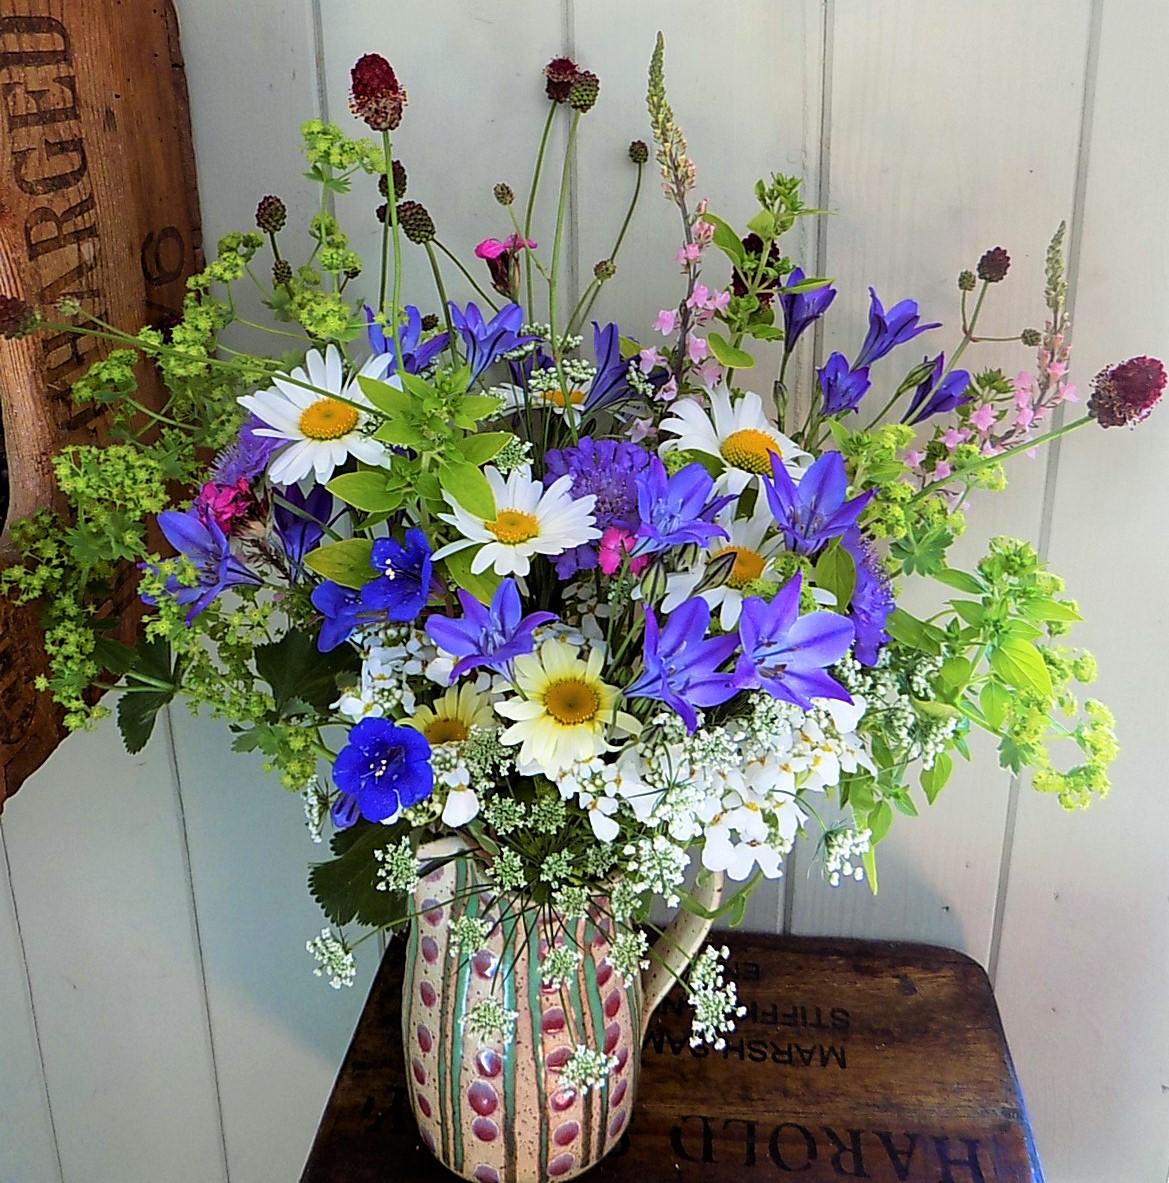 My top 10 perennials for cut flowers